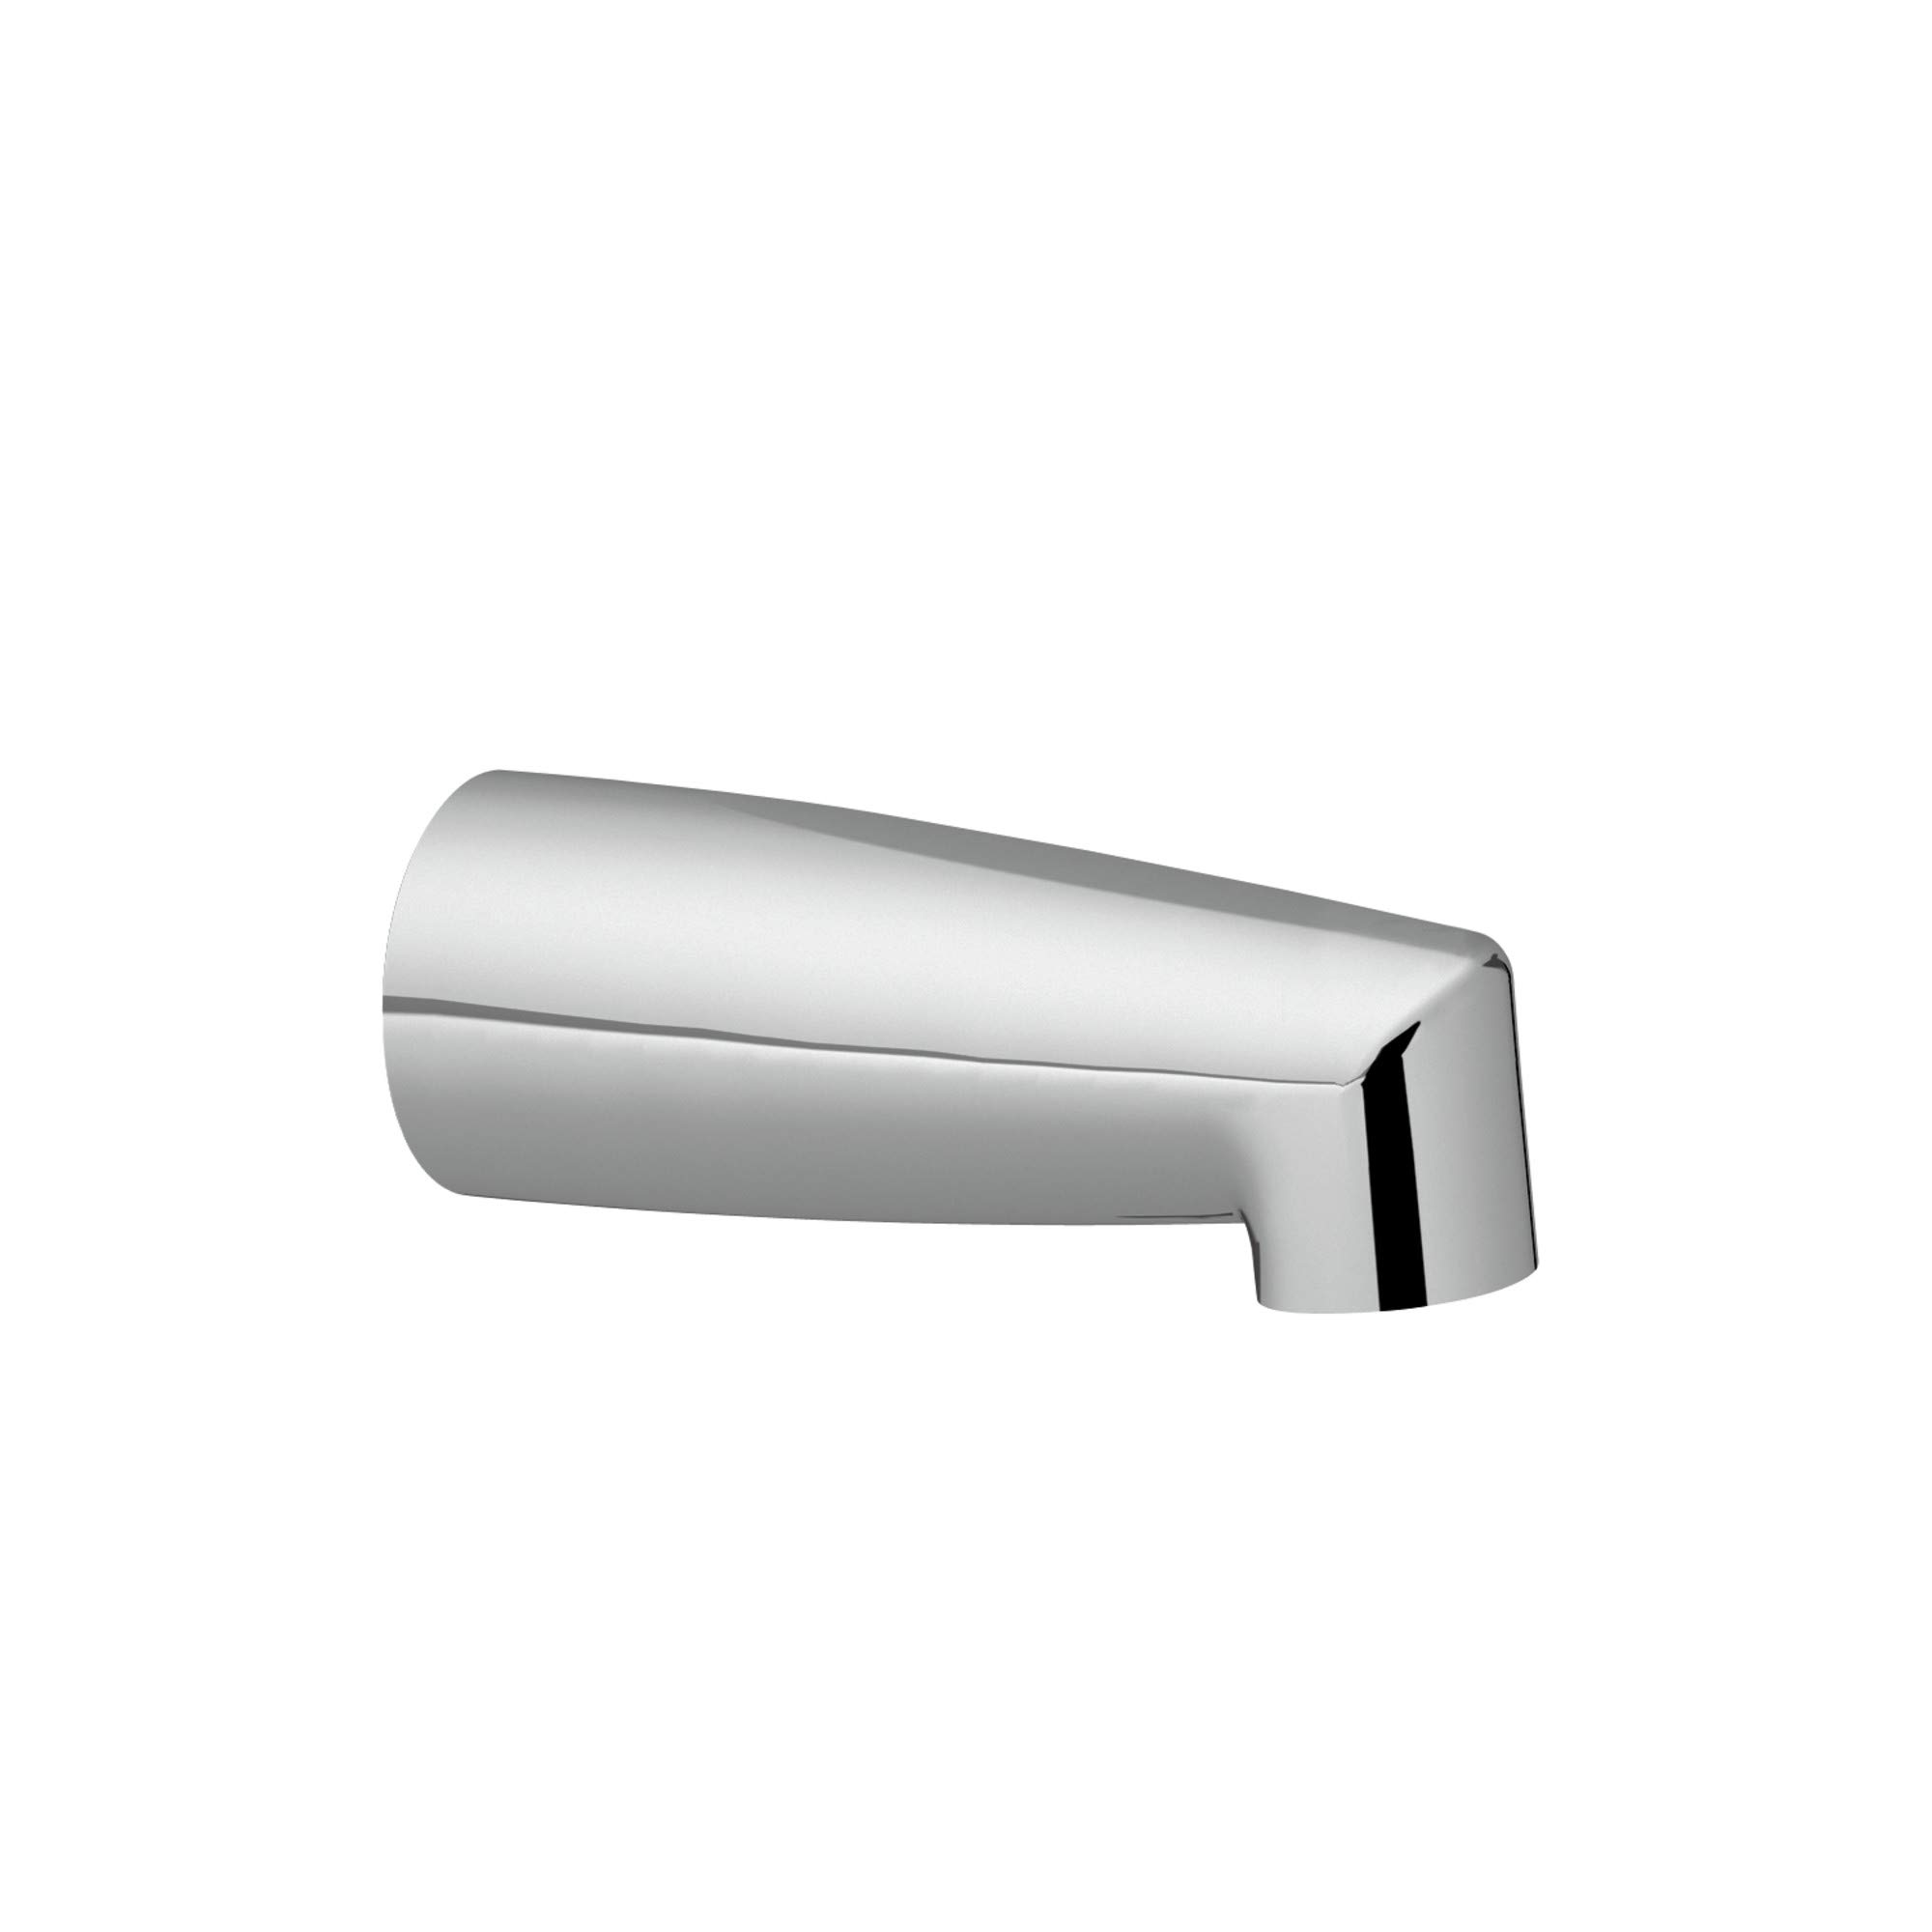 Moen 3829 Non-Diverter 1/2-Inch CC Slip-Fit Tub Filler Spout, Chrome by Moen